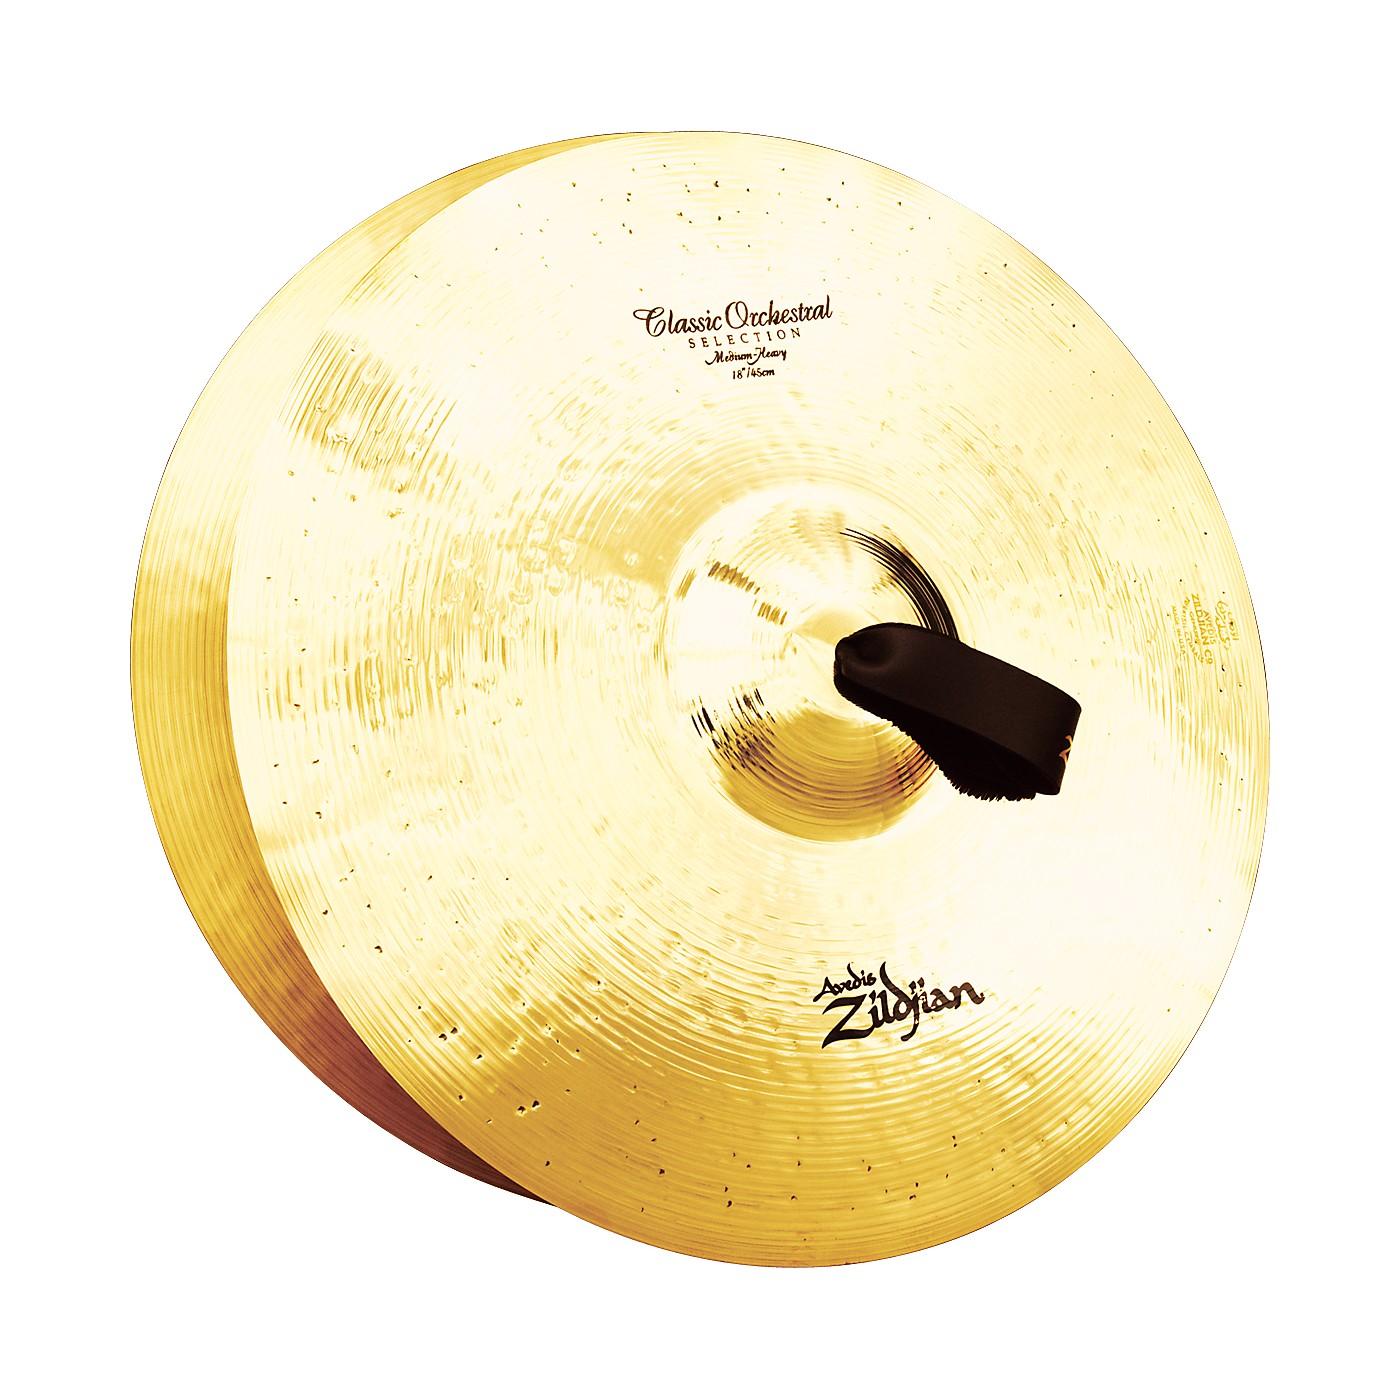 Zildjian A Classic Orchestral Medium Heavy Crash Cymbal Pair thumbnail